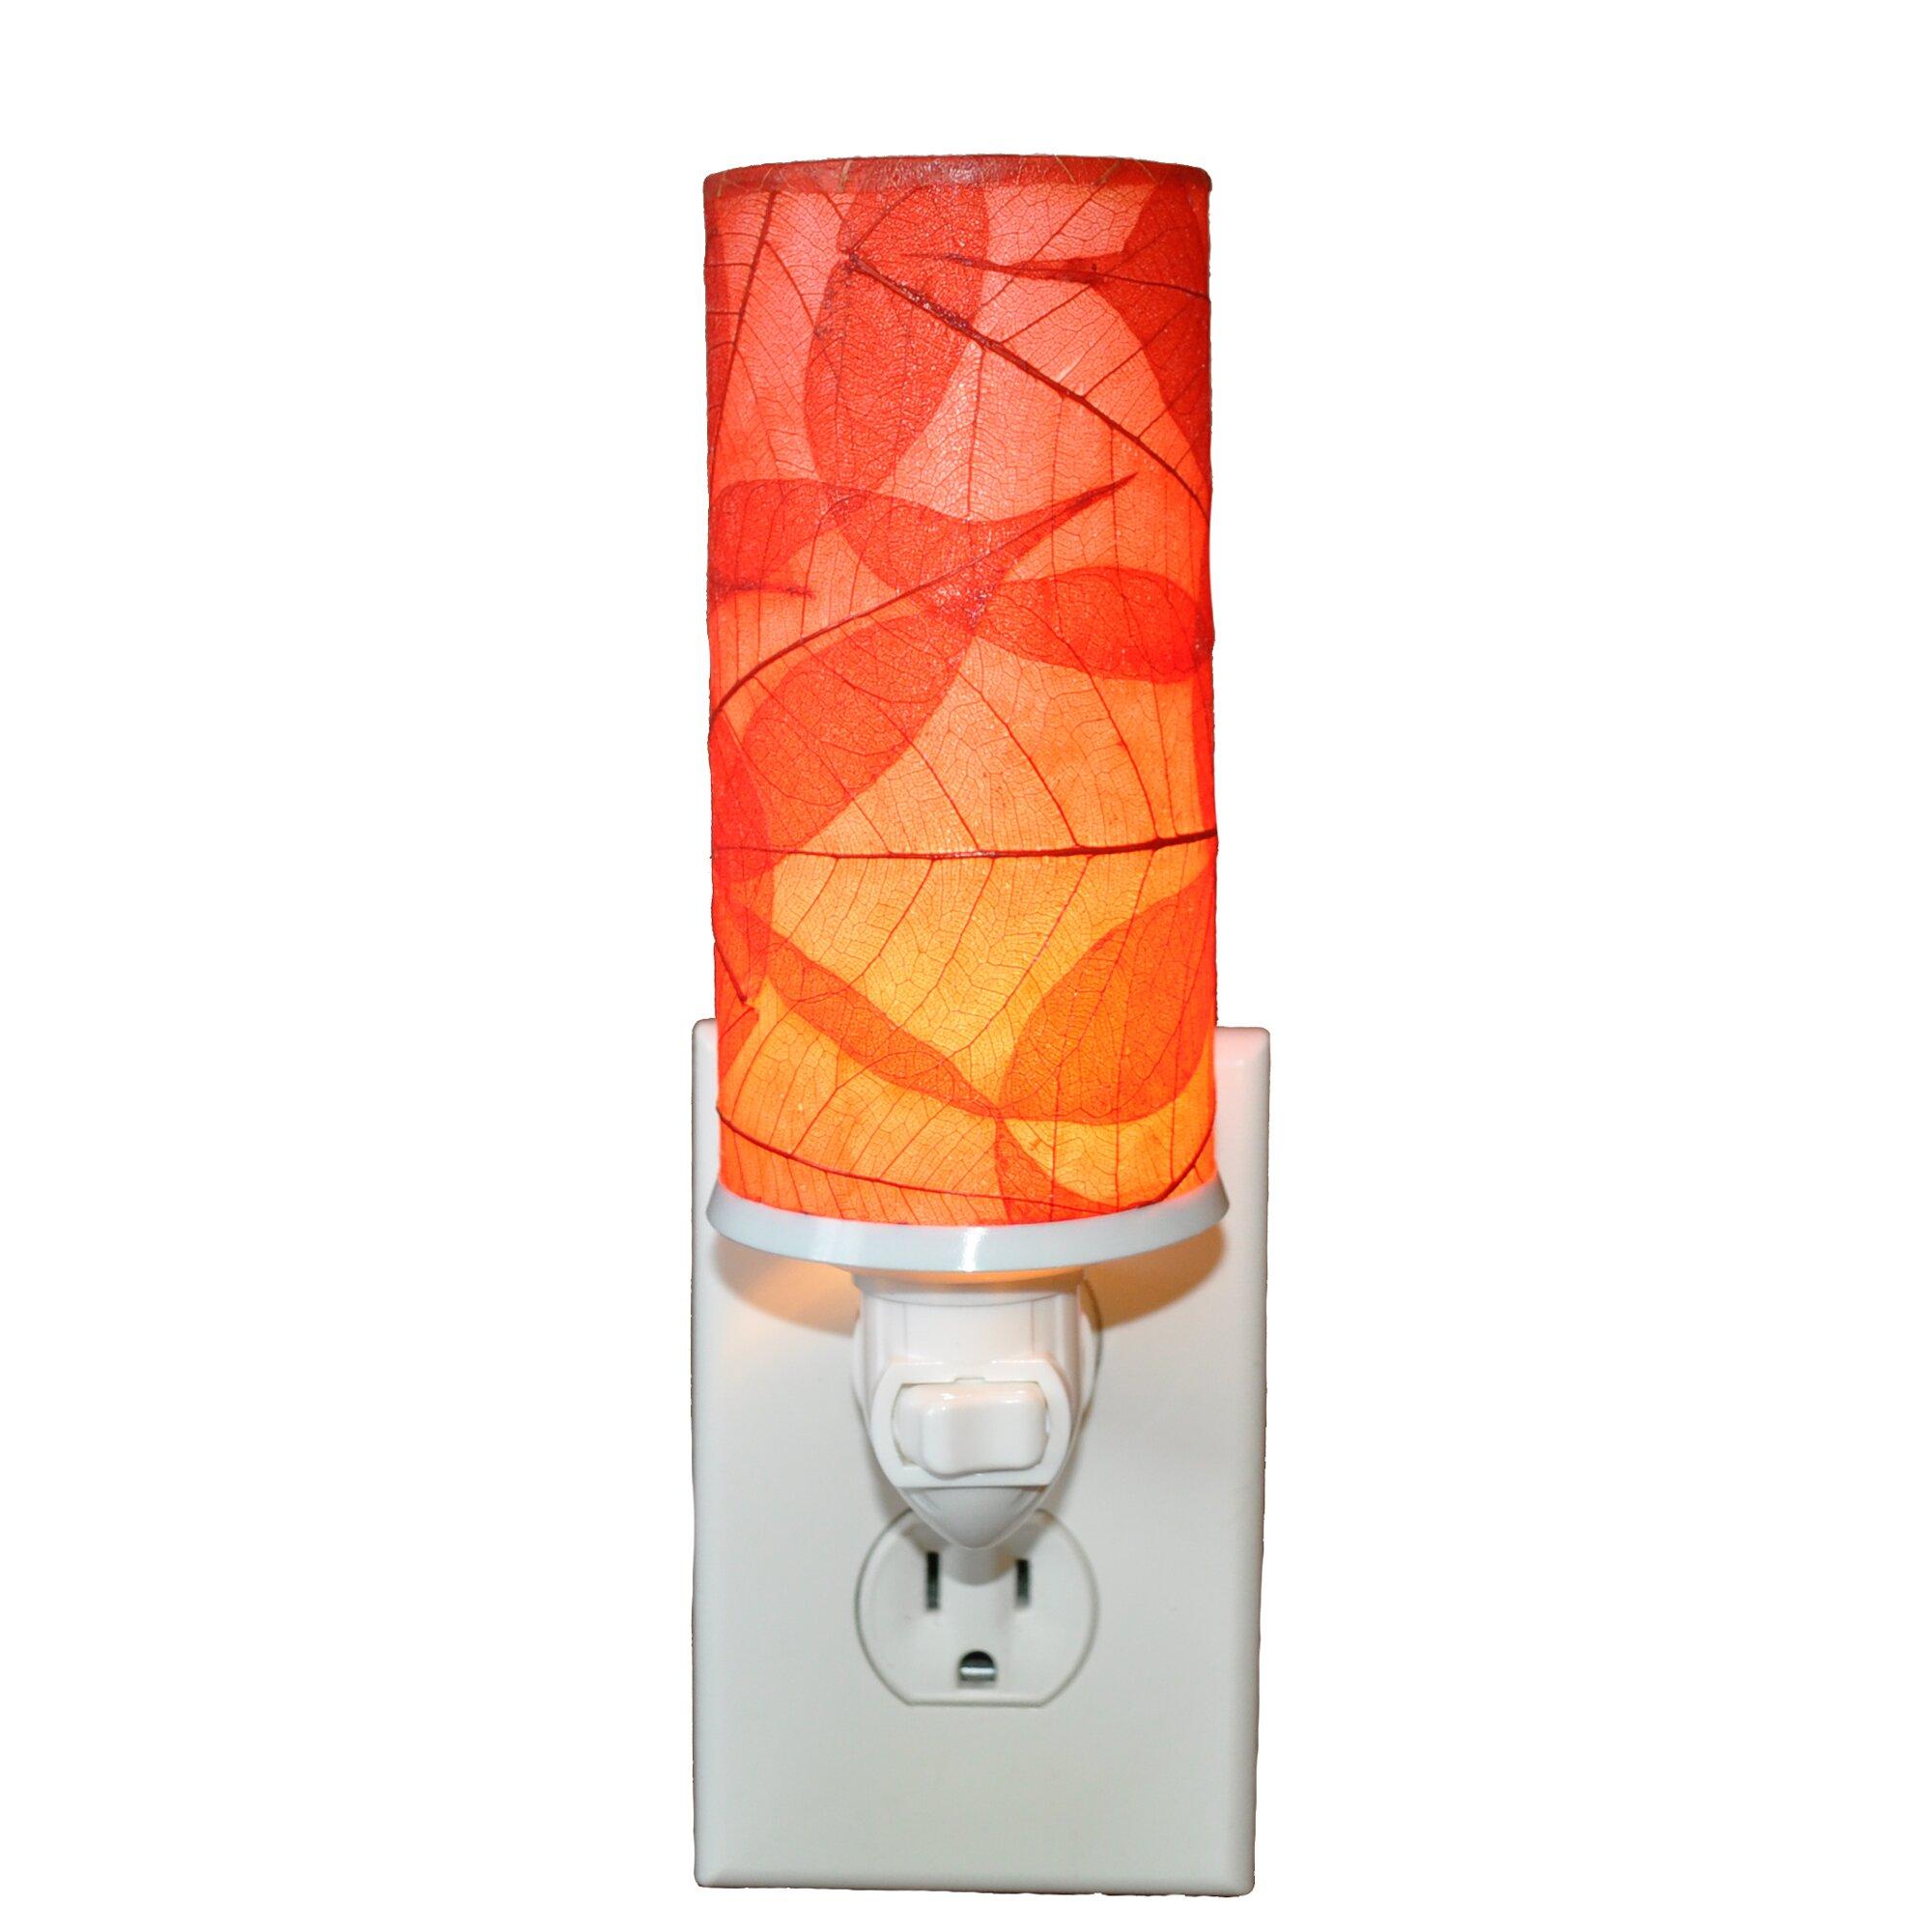 Automatic night lights decorative - Cylinder Night Light